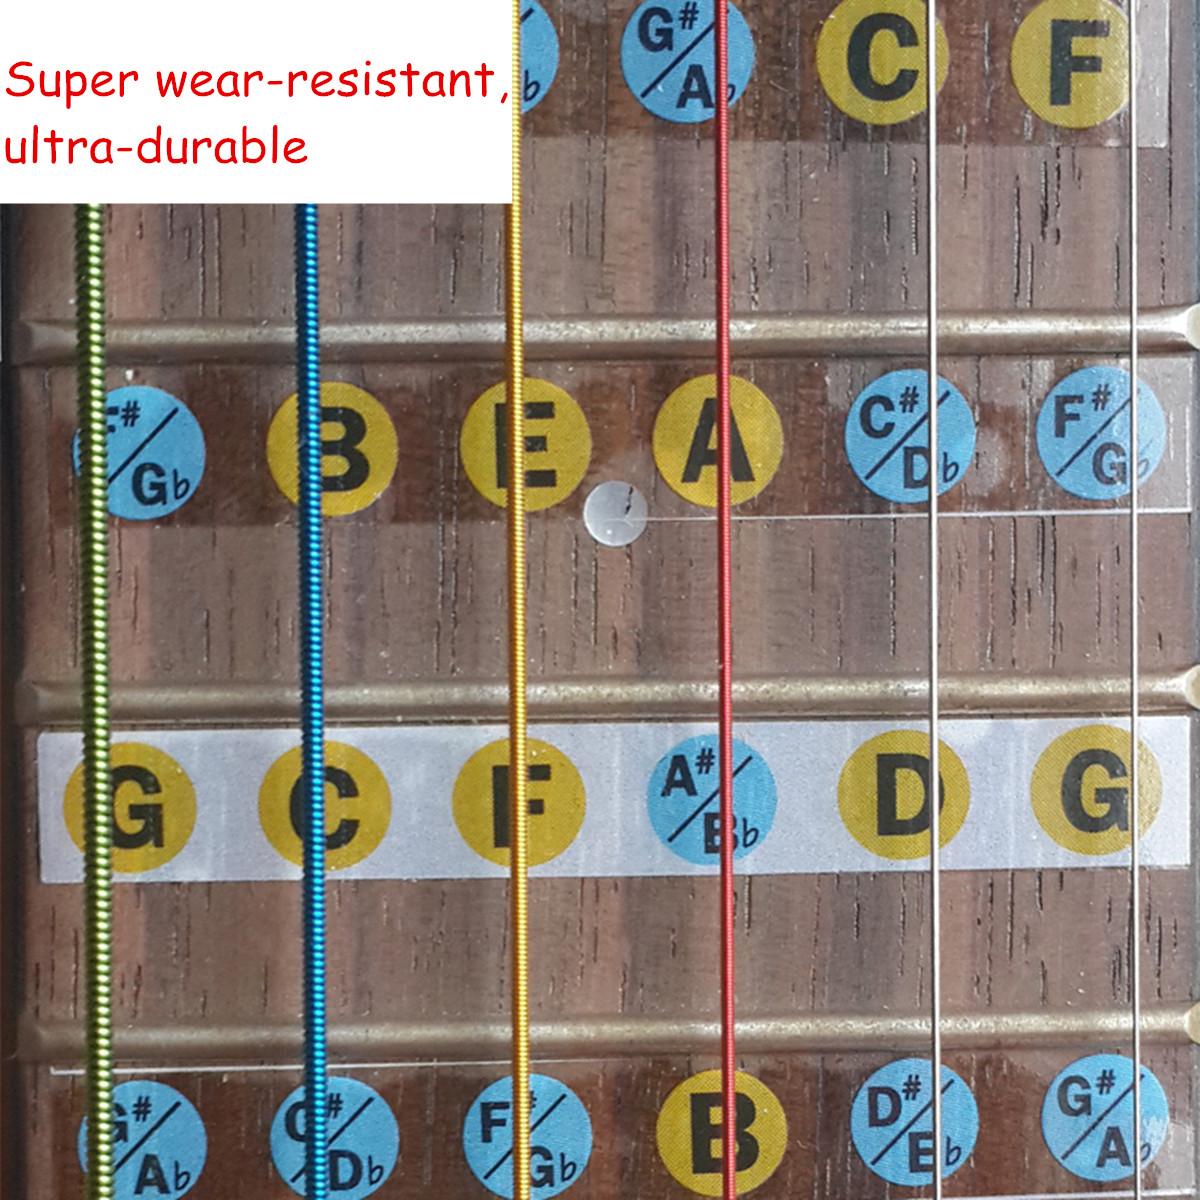 four strings bass guitar fretboard note label fret stickers supply for beginner ebay. Black Bedroom Furniture Sets. Home Design Ideas